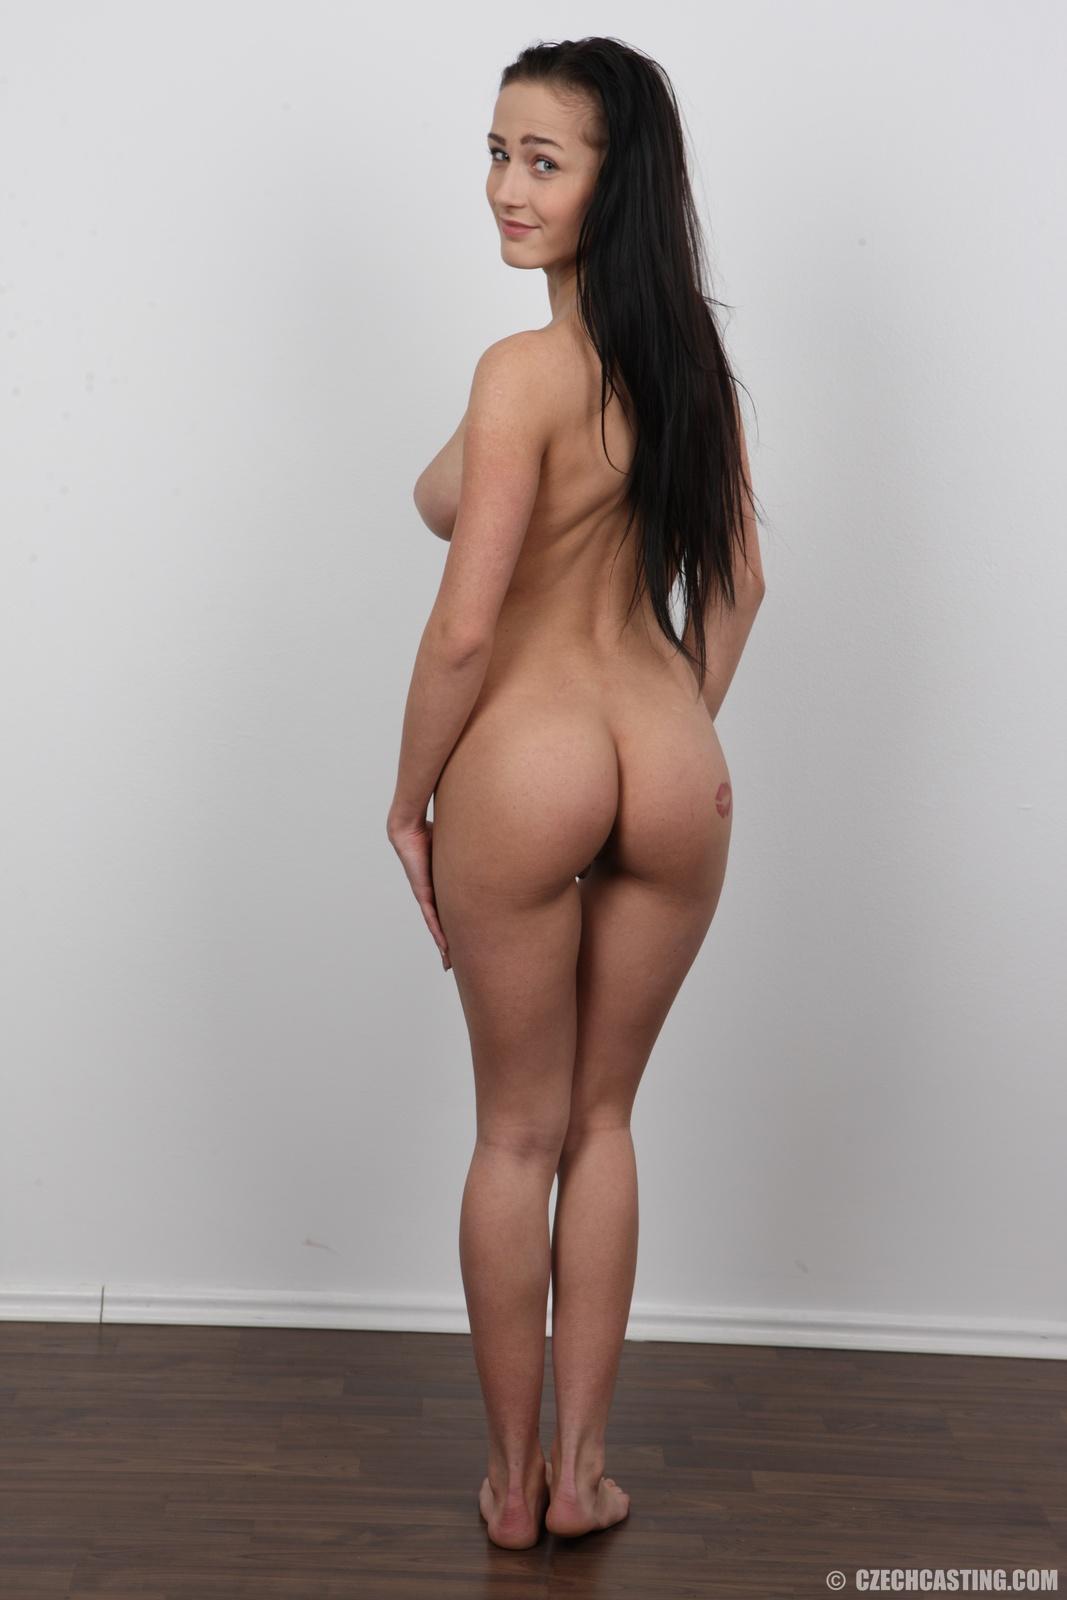 Sexy milf wants very rigid cock pounding her 7